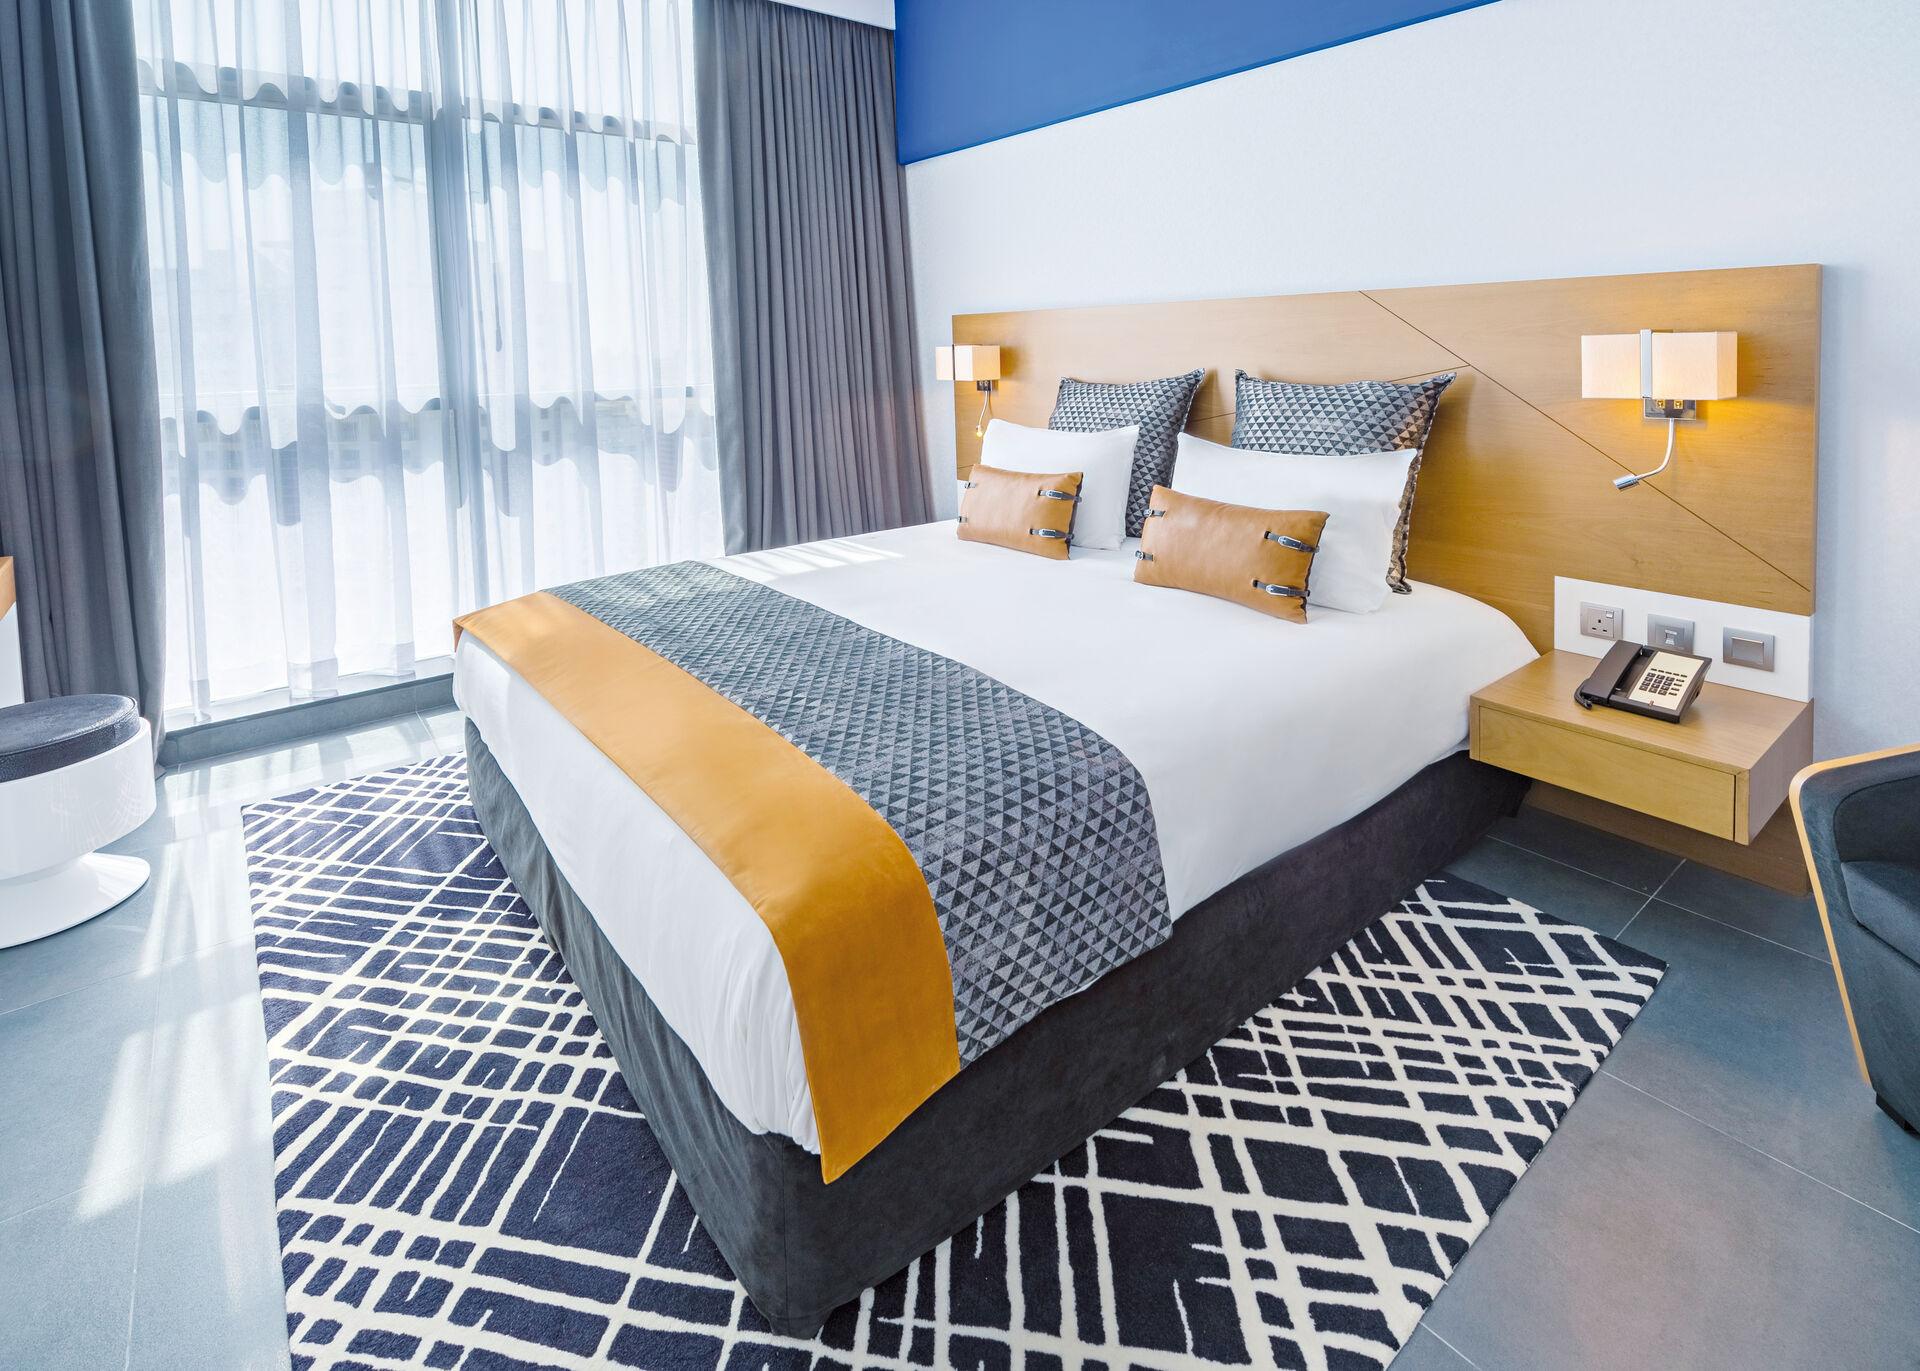 Emirats Arabes Unis - Dubaï - Hôtel Tryp by Wyndham Dubai 4*